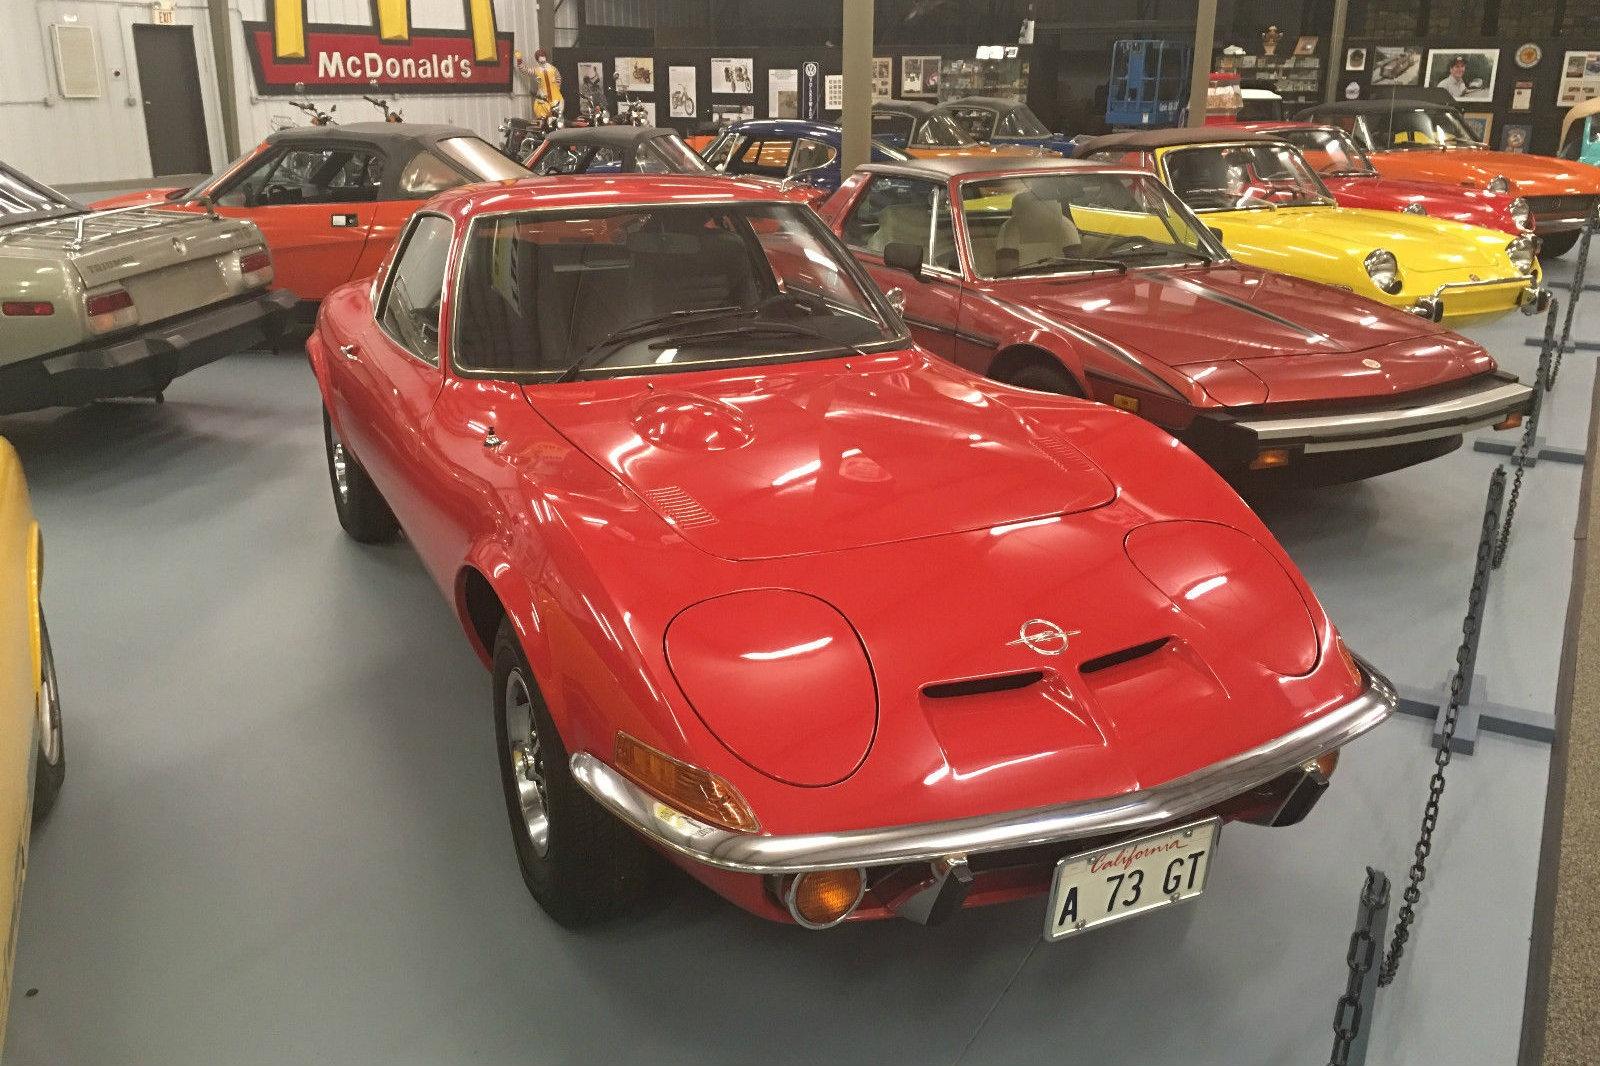 69 Opel Gt Wiring Electrical Diagrams 1972 Diagram 1453 Mile 1973 1969 Buick